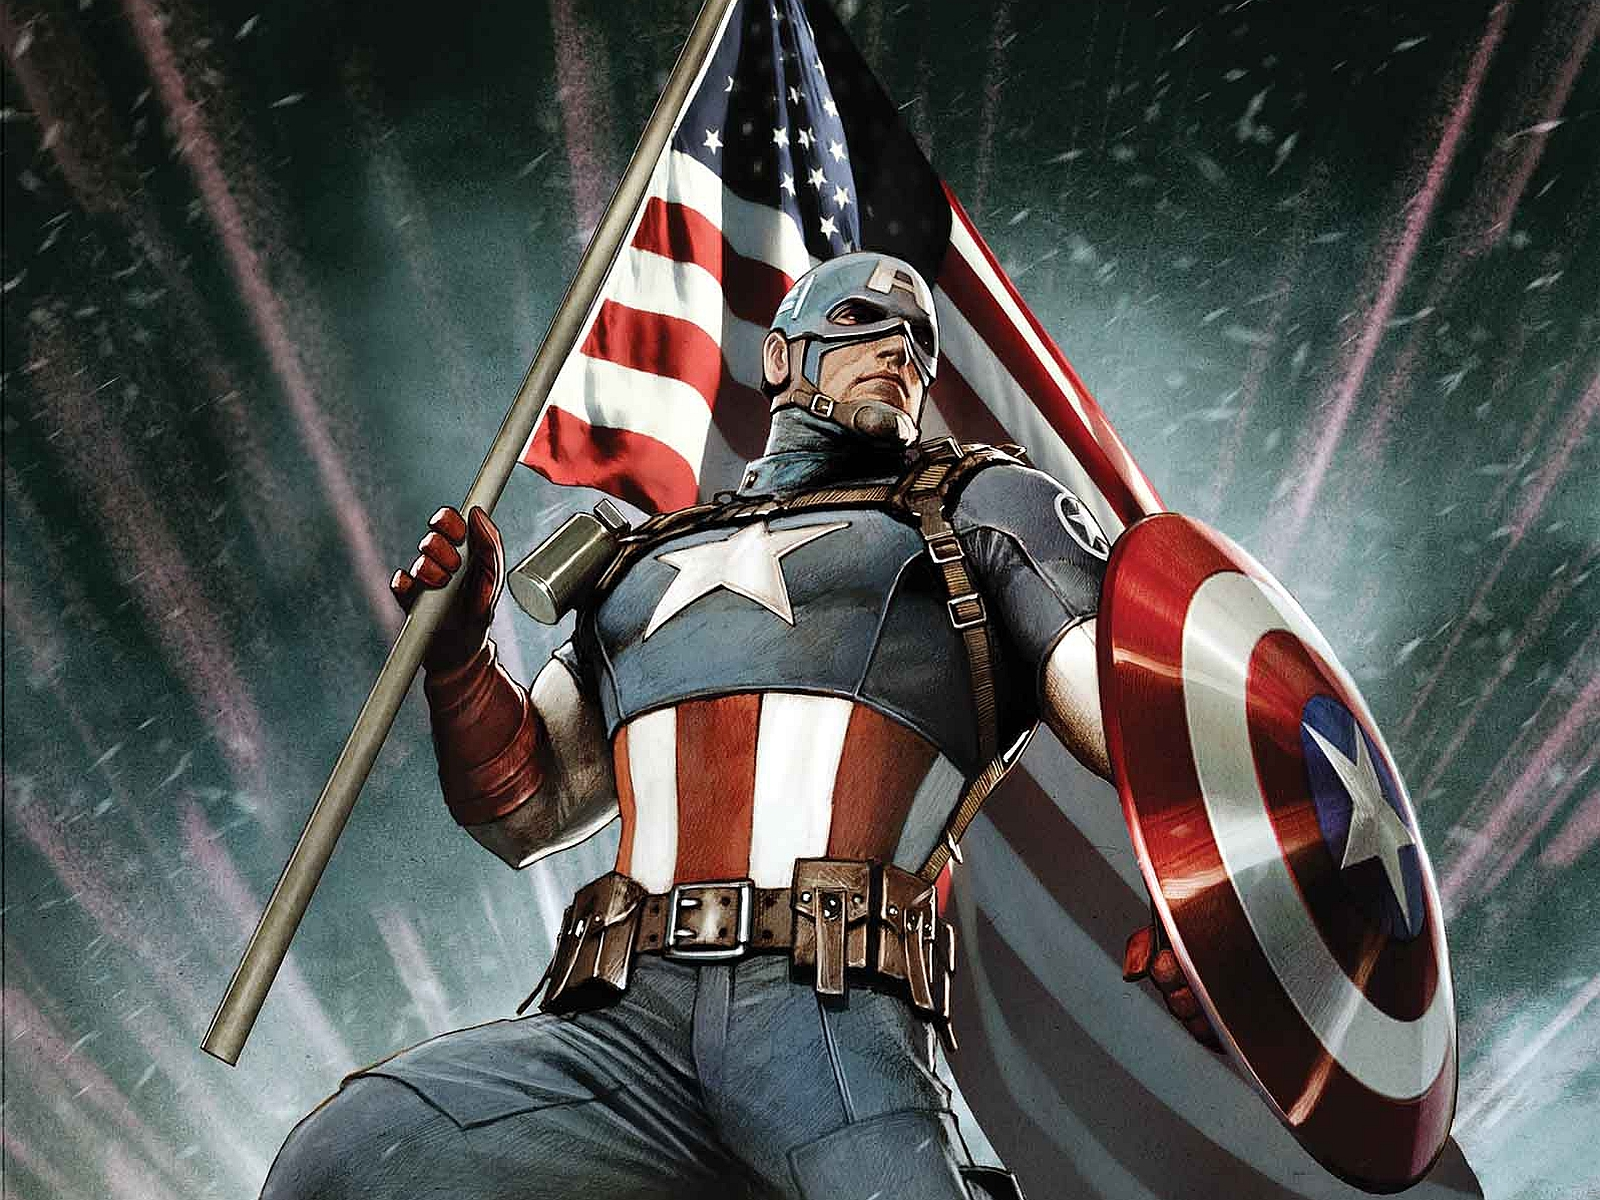 Captain America Computer Wallpapers Desktop Backgrounds 1600x1200 1600x1200